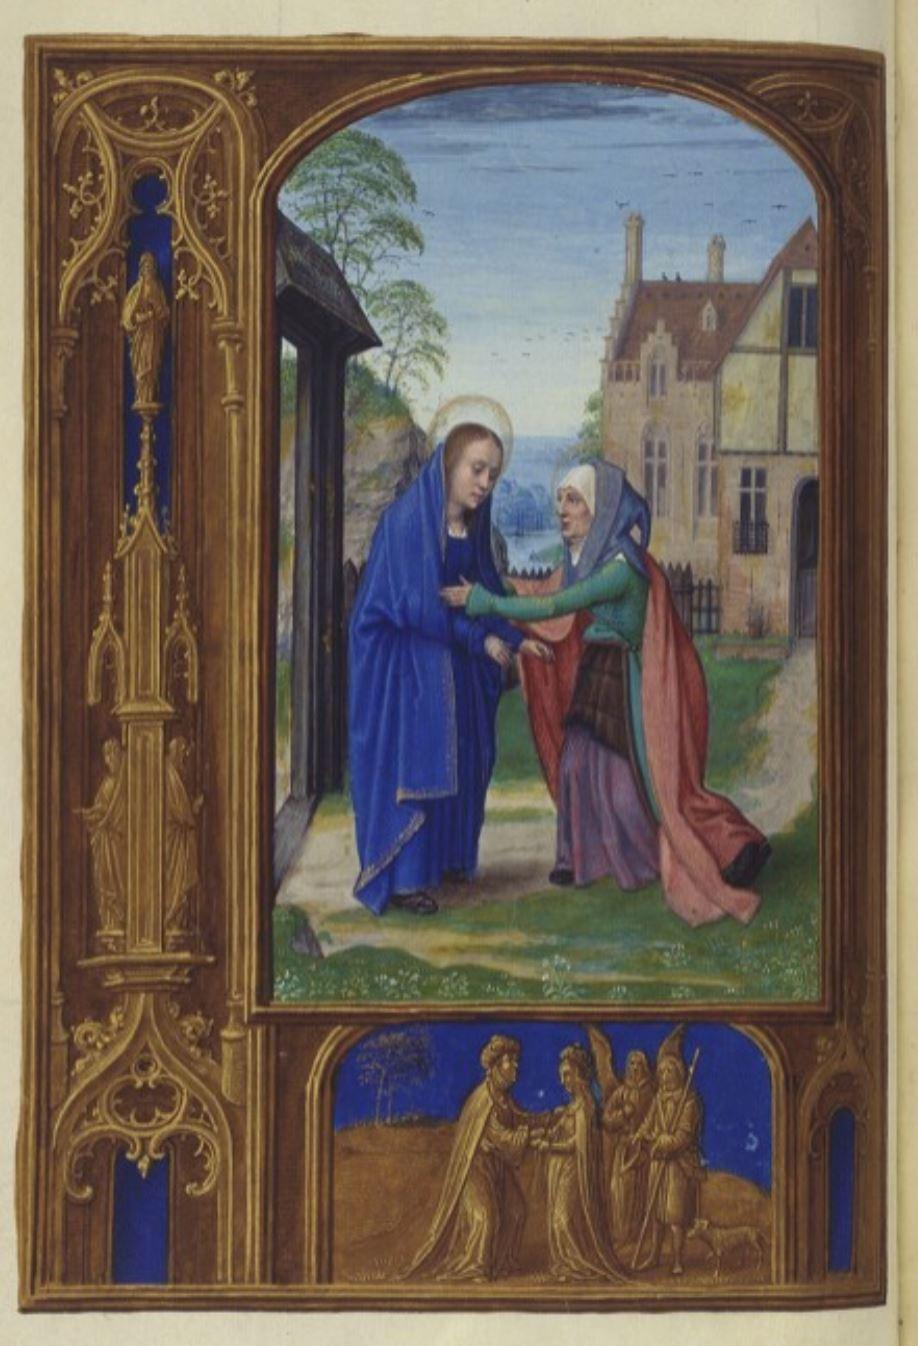 Croy Prayer book 1515-20 Simon Beining Visitation ONB Cod. 1858, fol. 54v